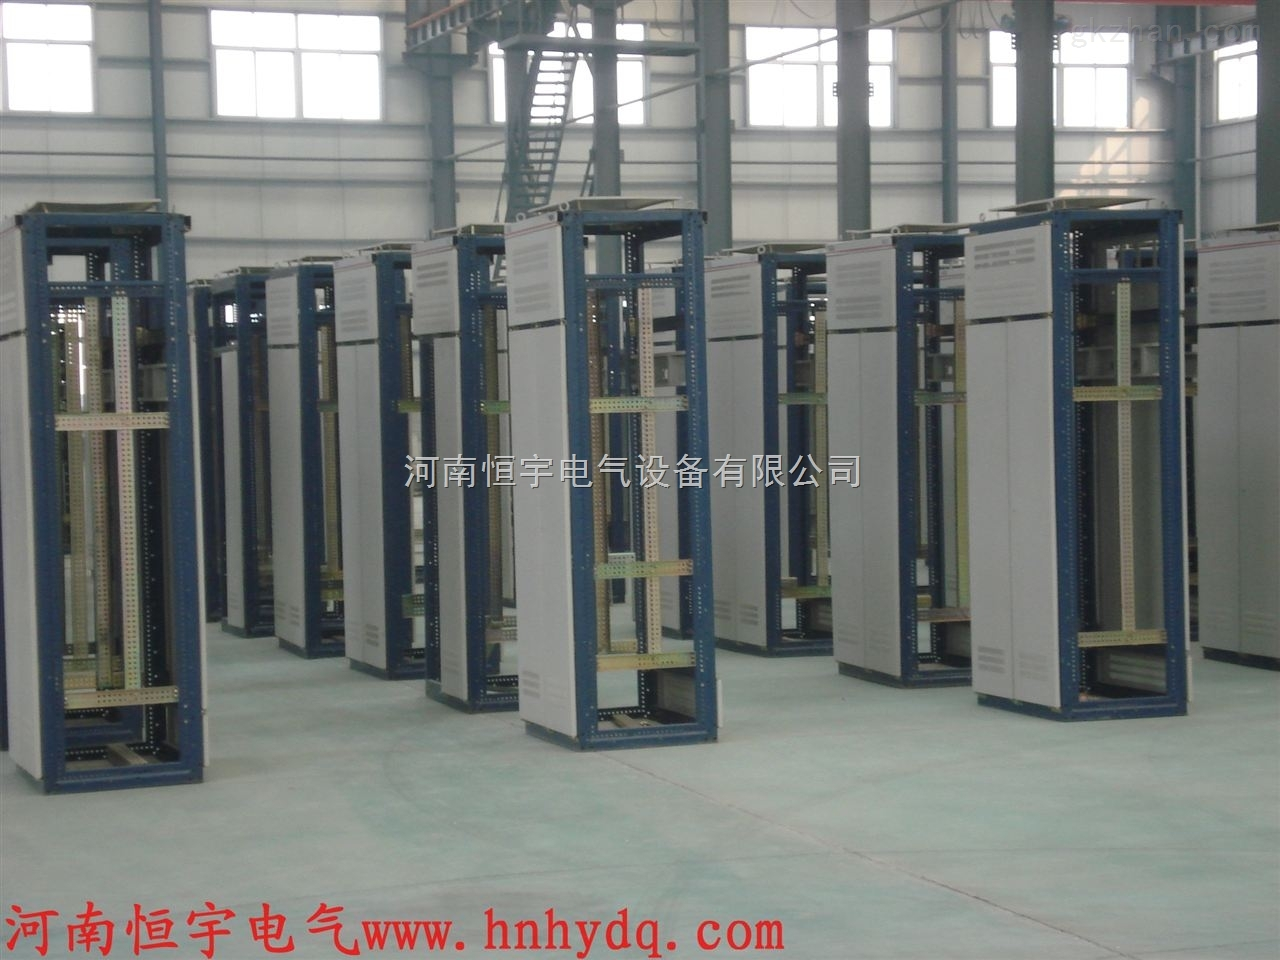 ggd低压开关柜-产品报价-河南恒宇电气设备有限公司